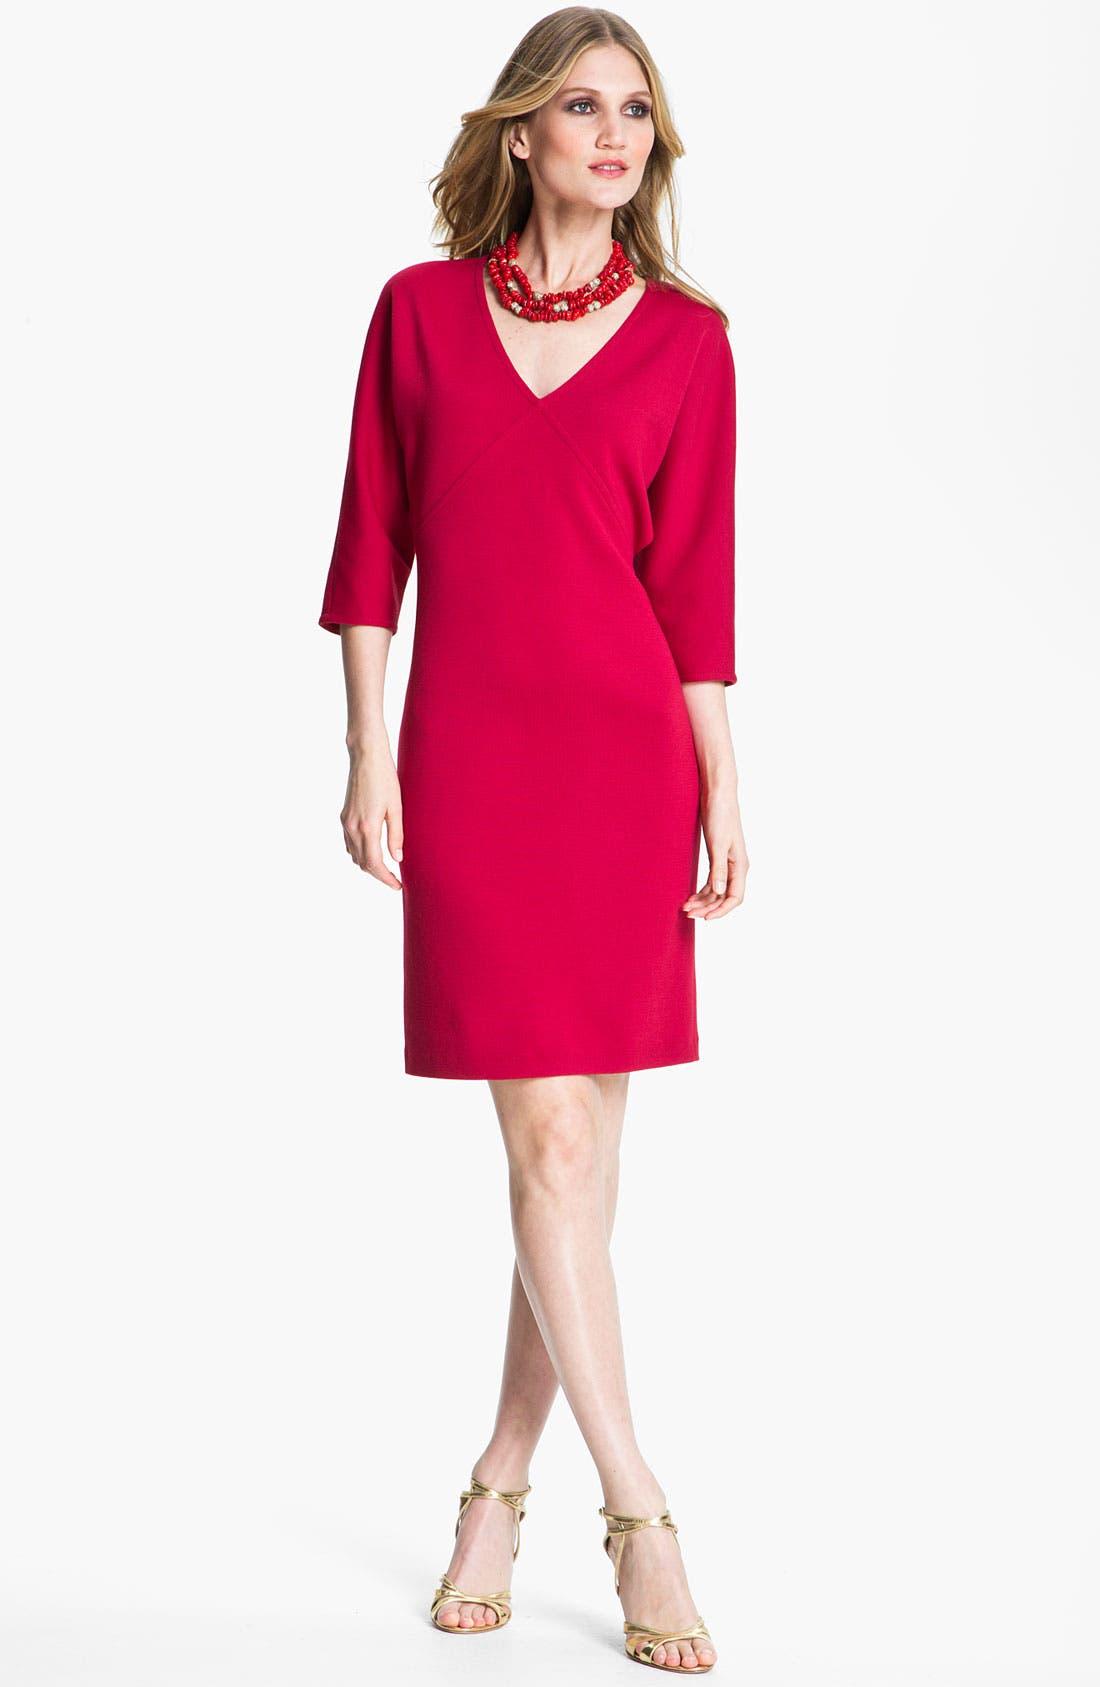 Alternate Image 1 Selected - St. John Collection V-Neck Milano Knit Dress